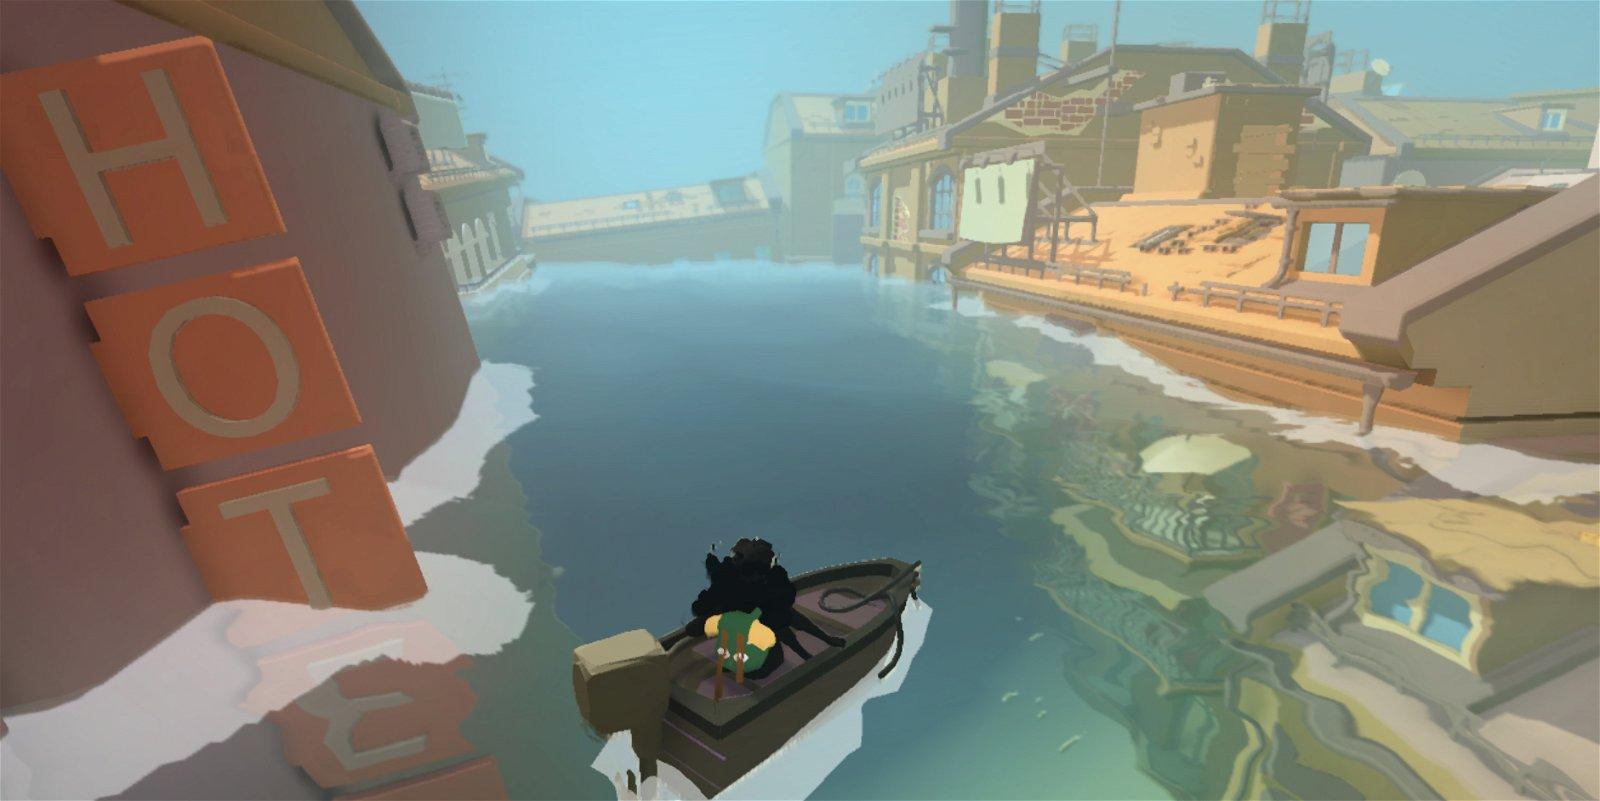 Sea_Of_Solitude_Jo-Mei_Games_Screenshot_1